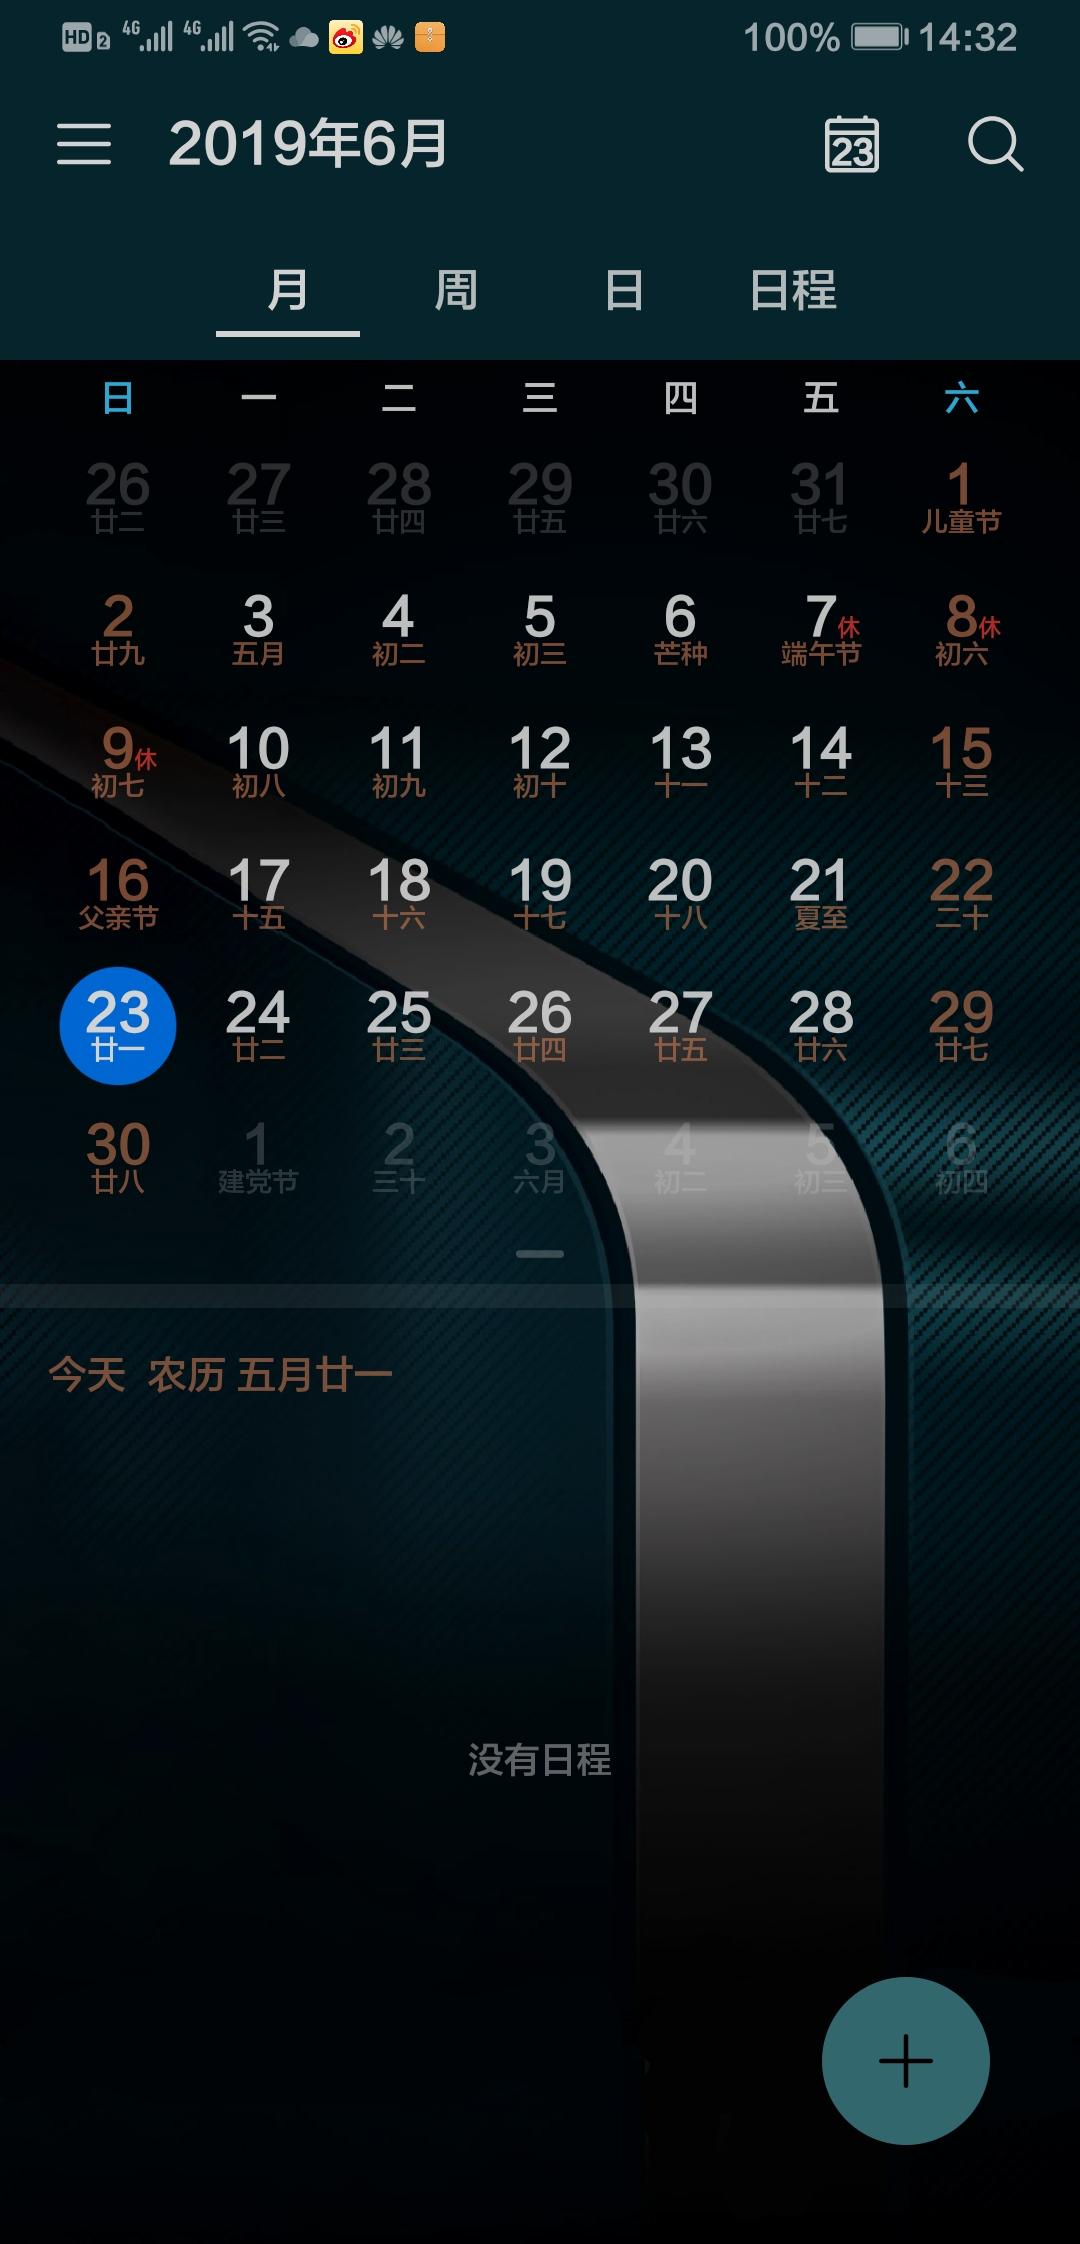 Screenshot_20190623_143257_com.android.calendar.jpg